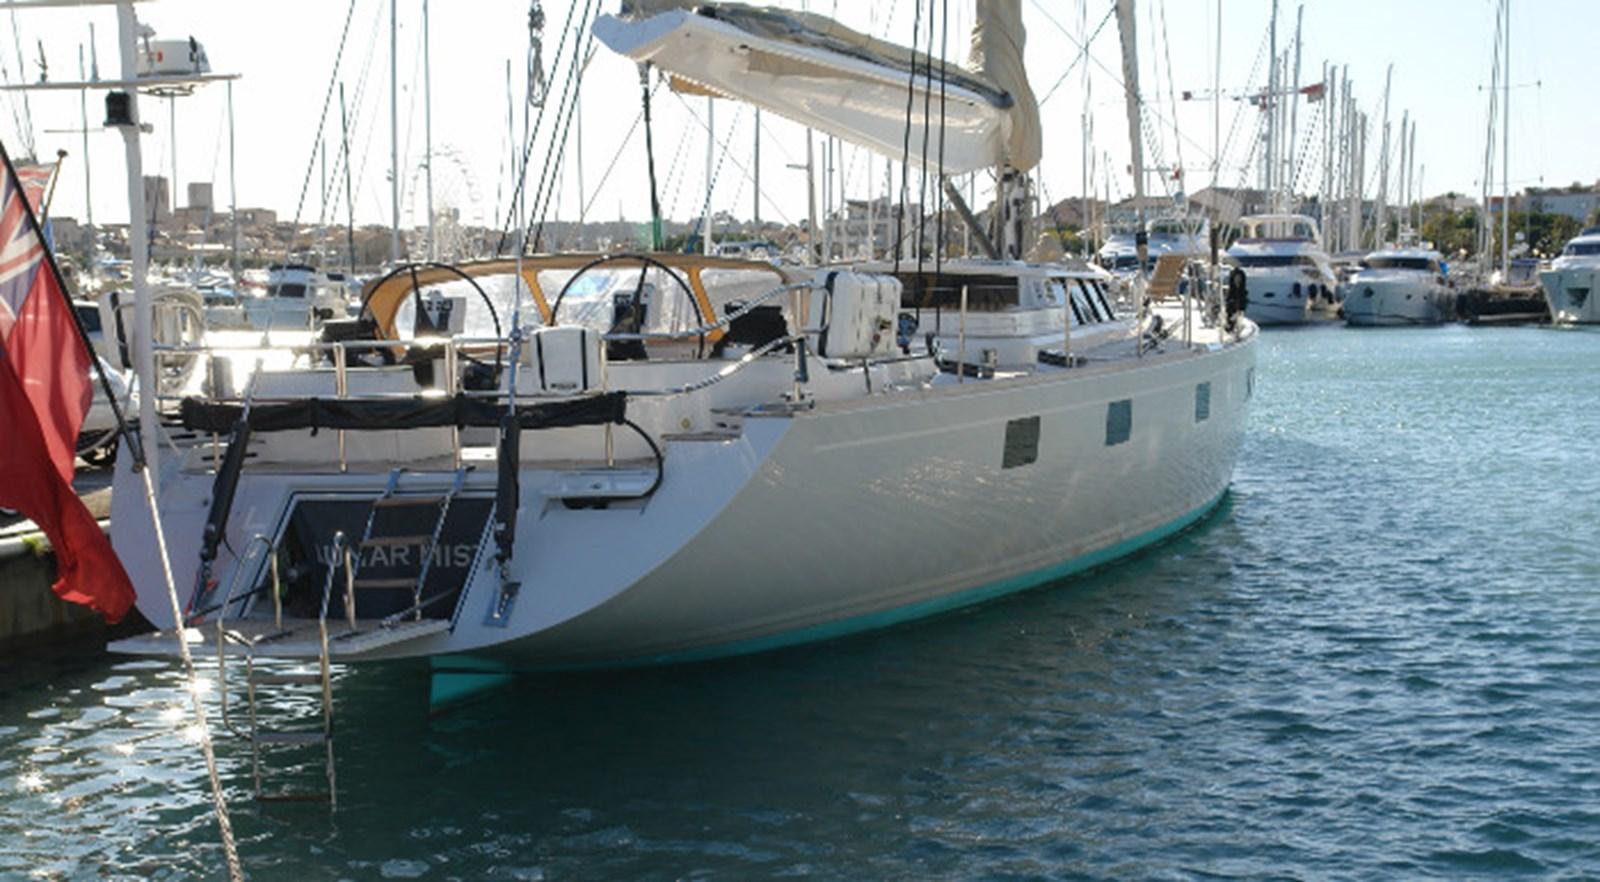 LUNAR MIST Bill Trip Design Sailing Yacht 002 1992 WINDSHIP YACHTS Custom Cutter Rigged Sloop Cruising Sailboat 2778472